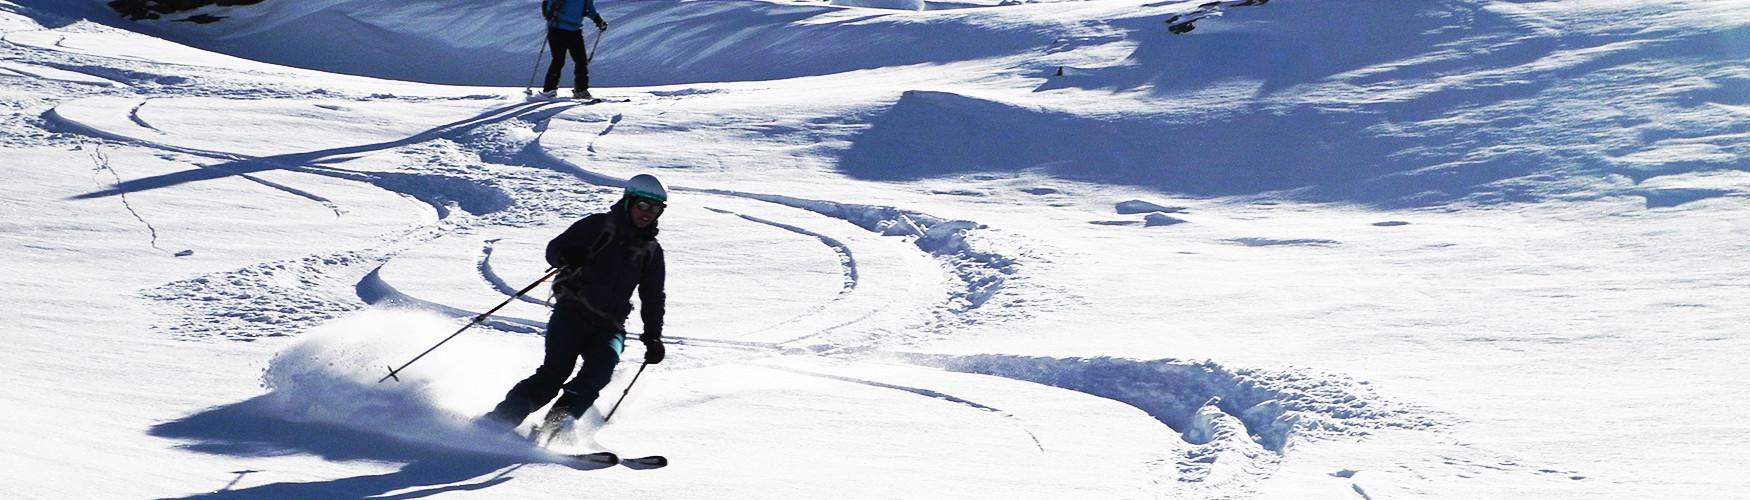 Skitouren Kurs, Skitourenkurs Bergführer